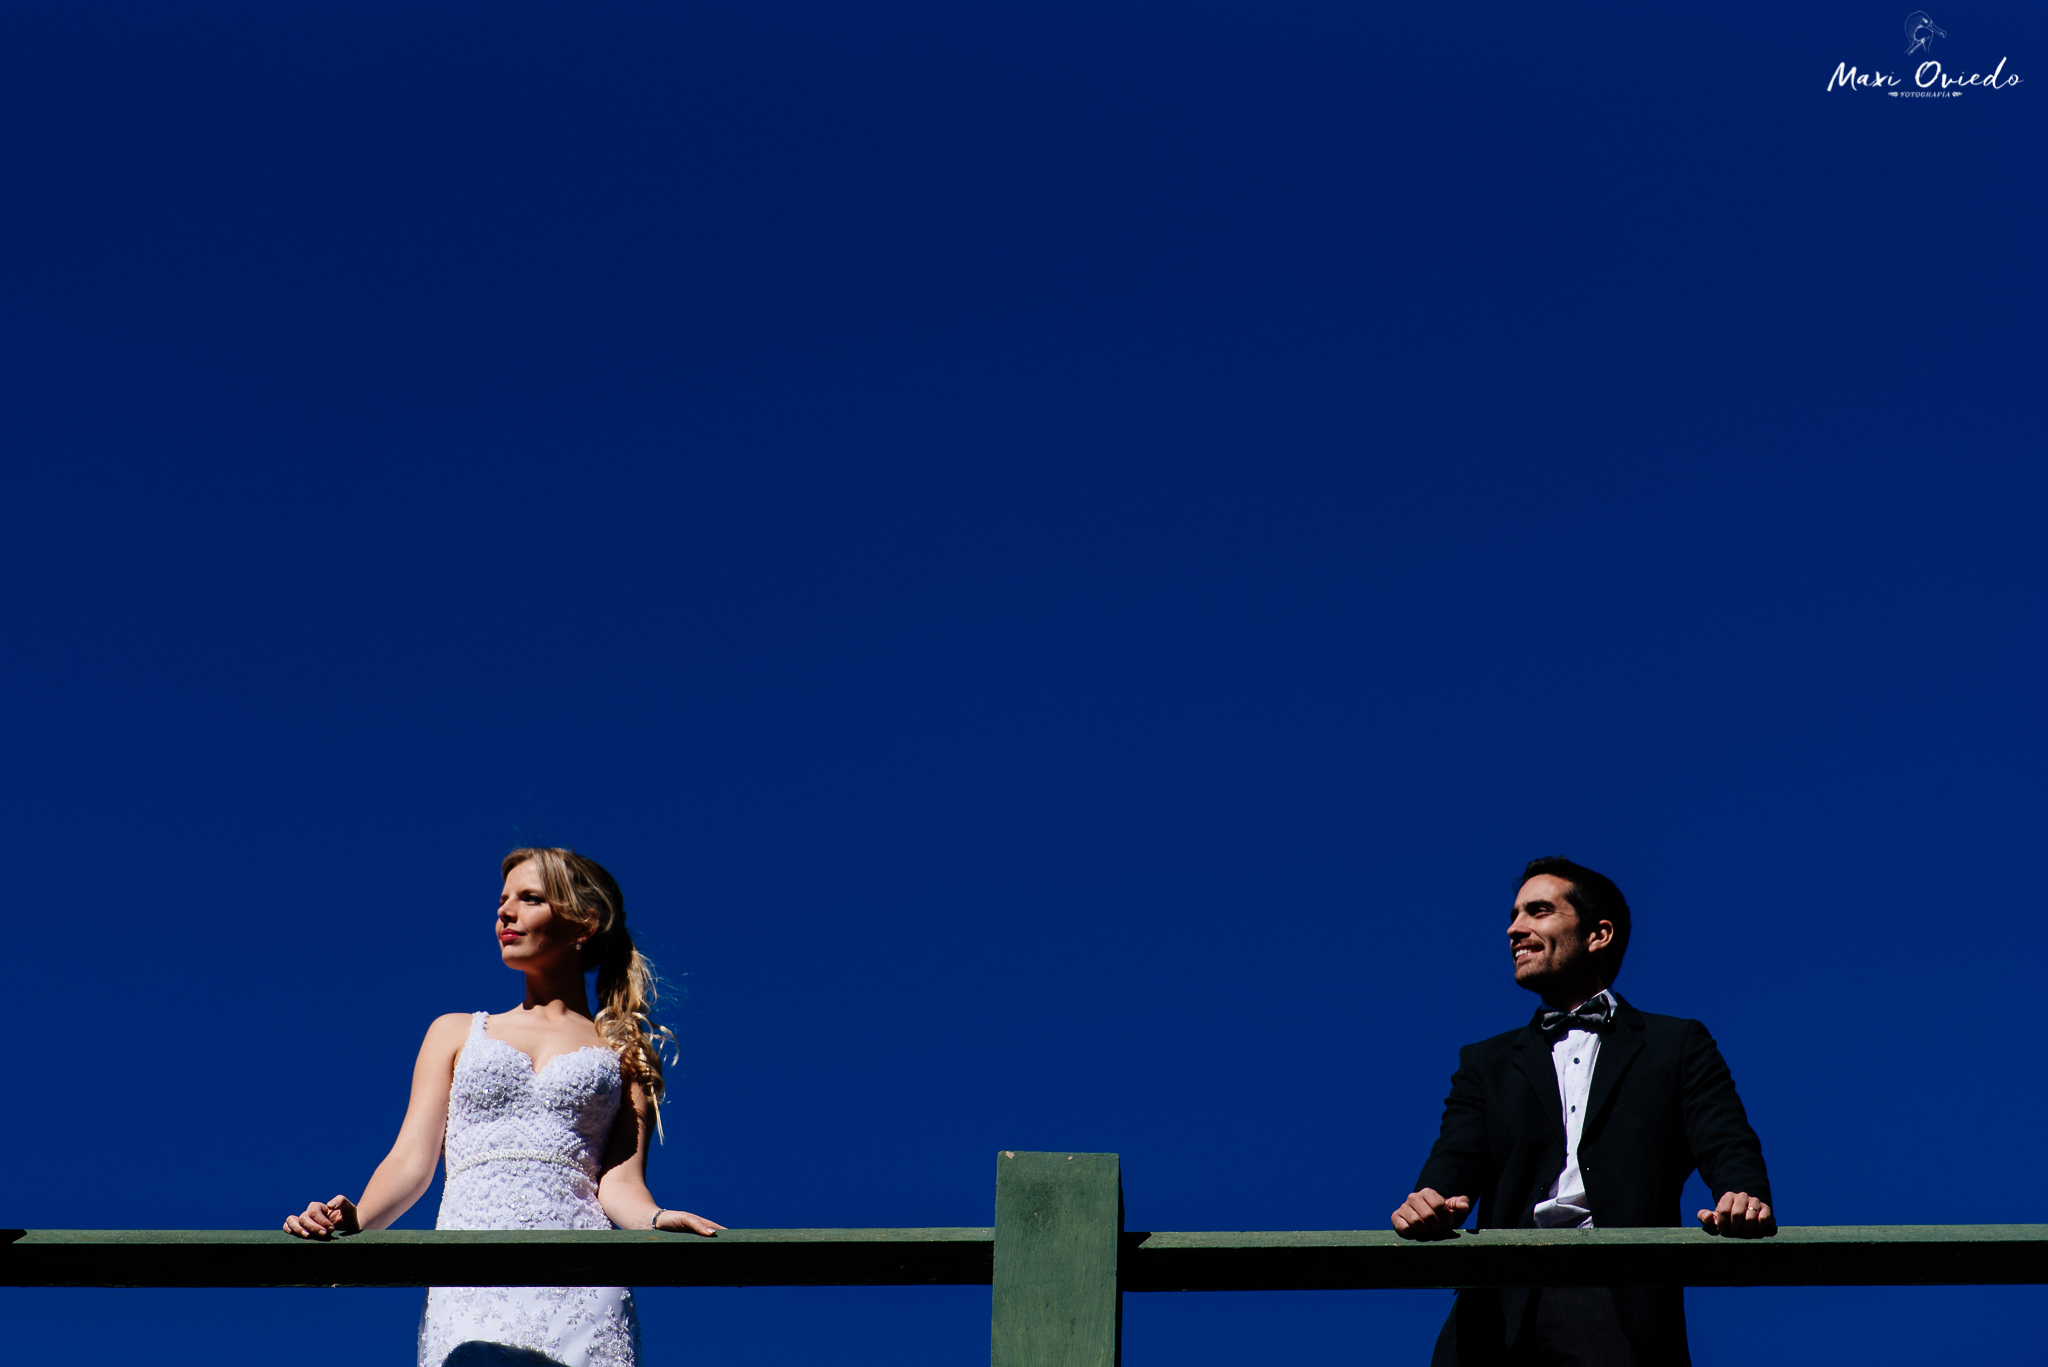 boda sextuple la cumbre cordoba cuchi corral fotografo de bodas fotografo de casamientos rosario san nicolas argentina vestido de novia ramo de novia-3.jpg